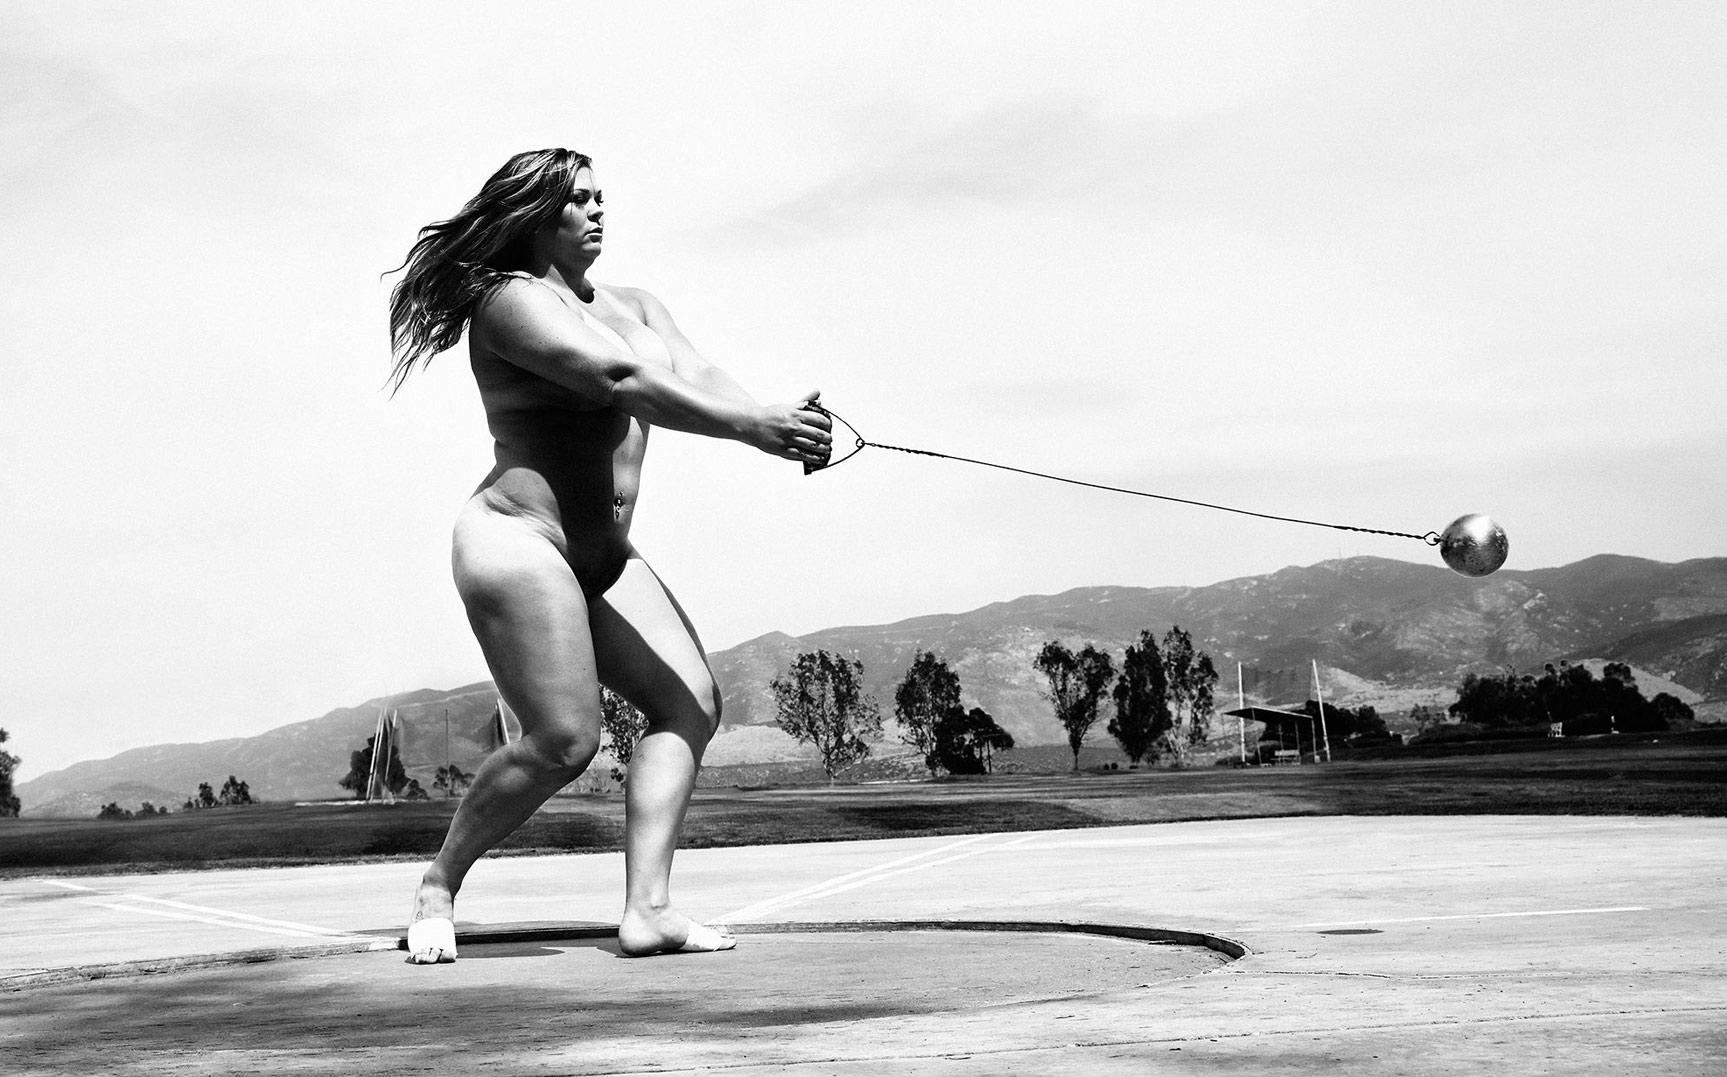 ESPN Magazine The Body Issue 2015 - Amanda Bingson / Аманда Бингсон - Культ тела журнала ESPN